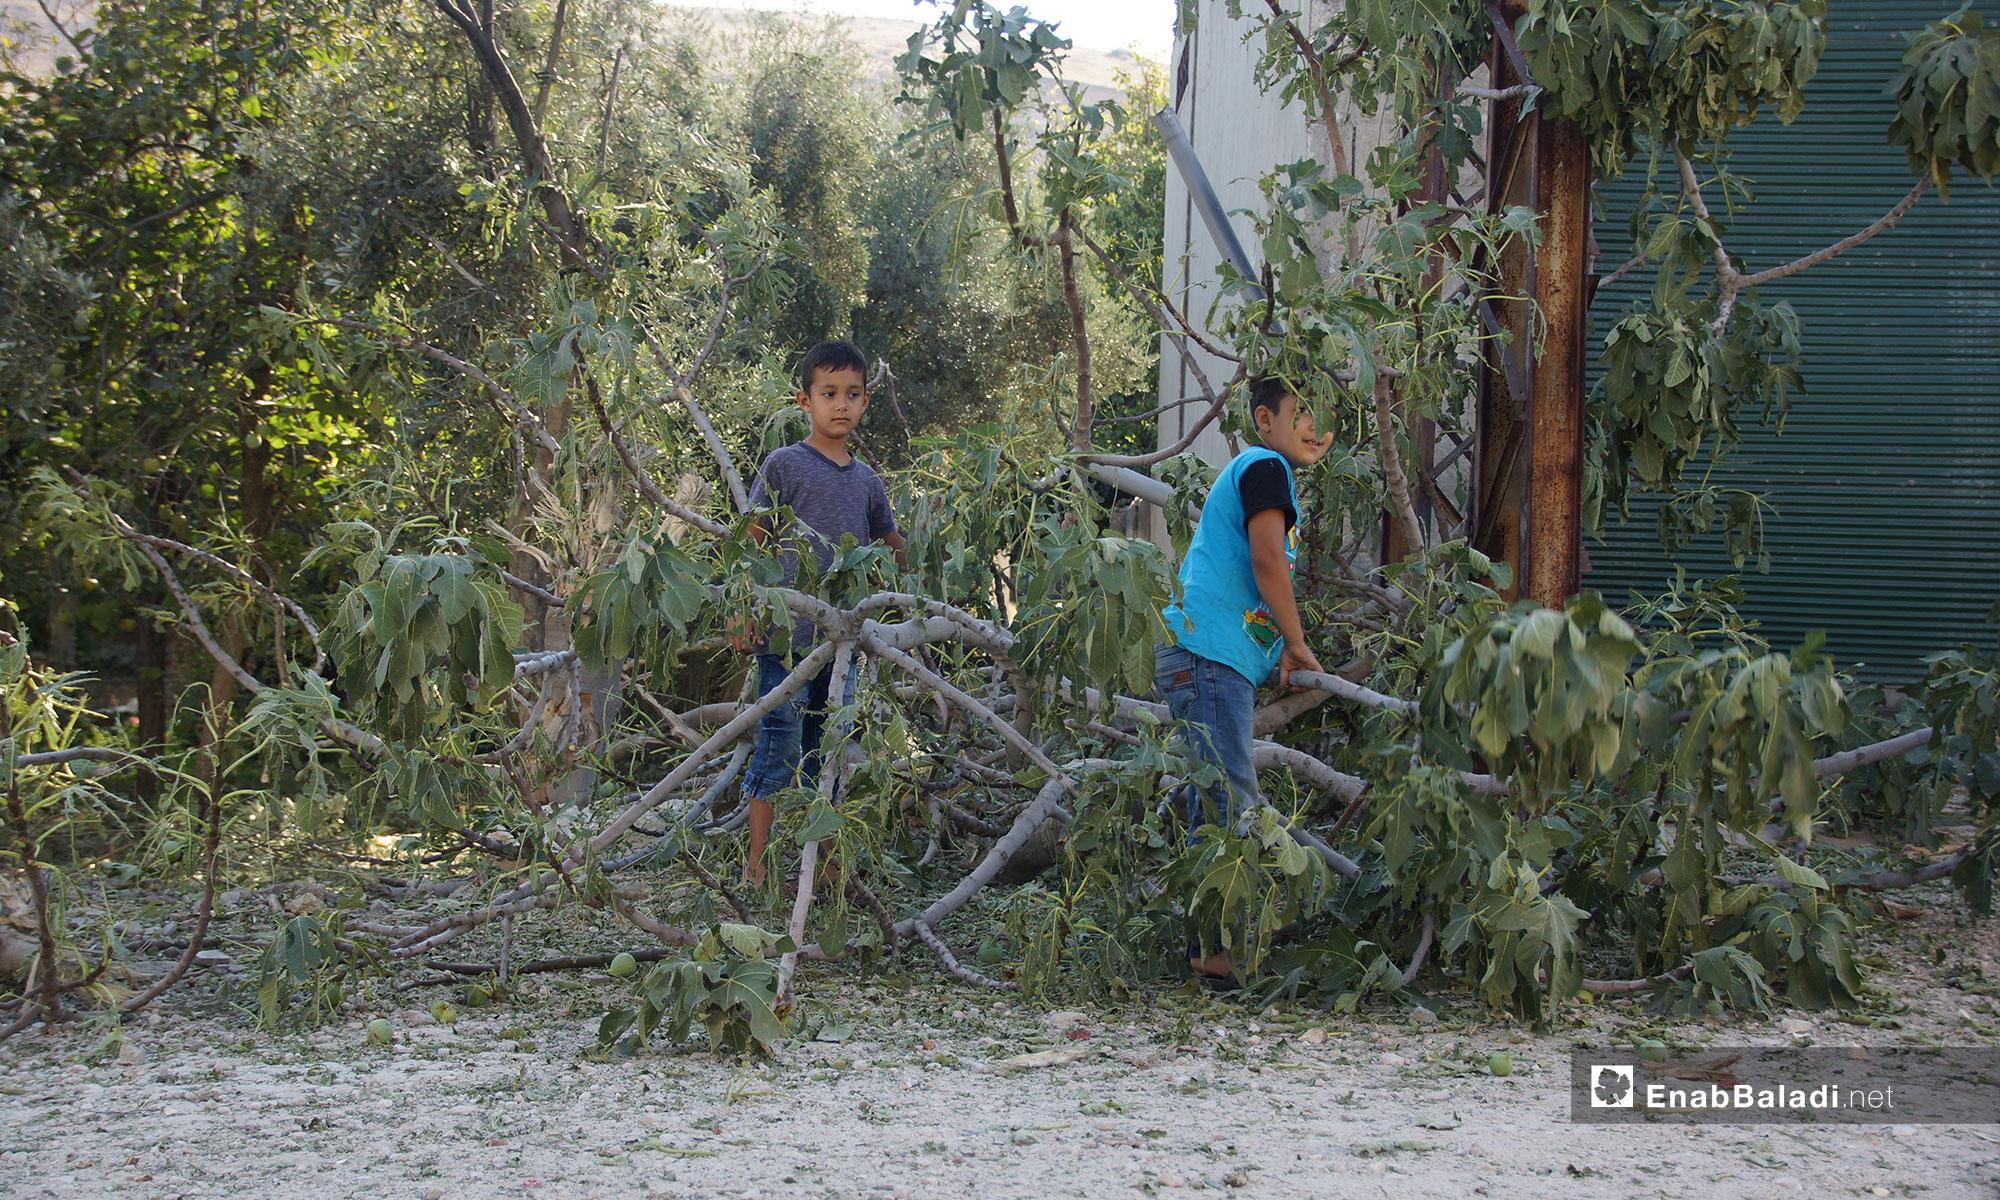 Two children at Qalaat al-Madiq town, rural Hama – September 9, 2018 (Enab Baladi)